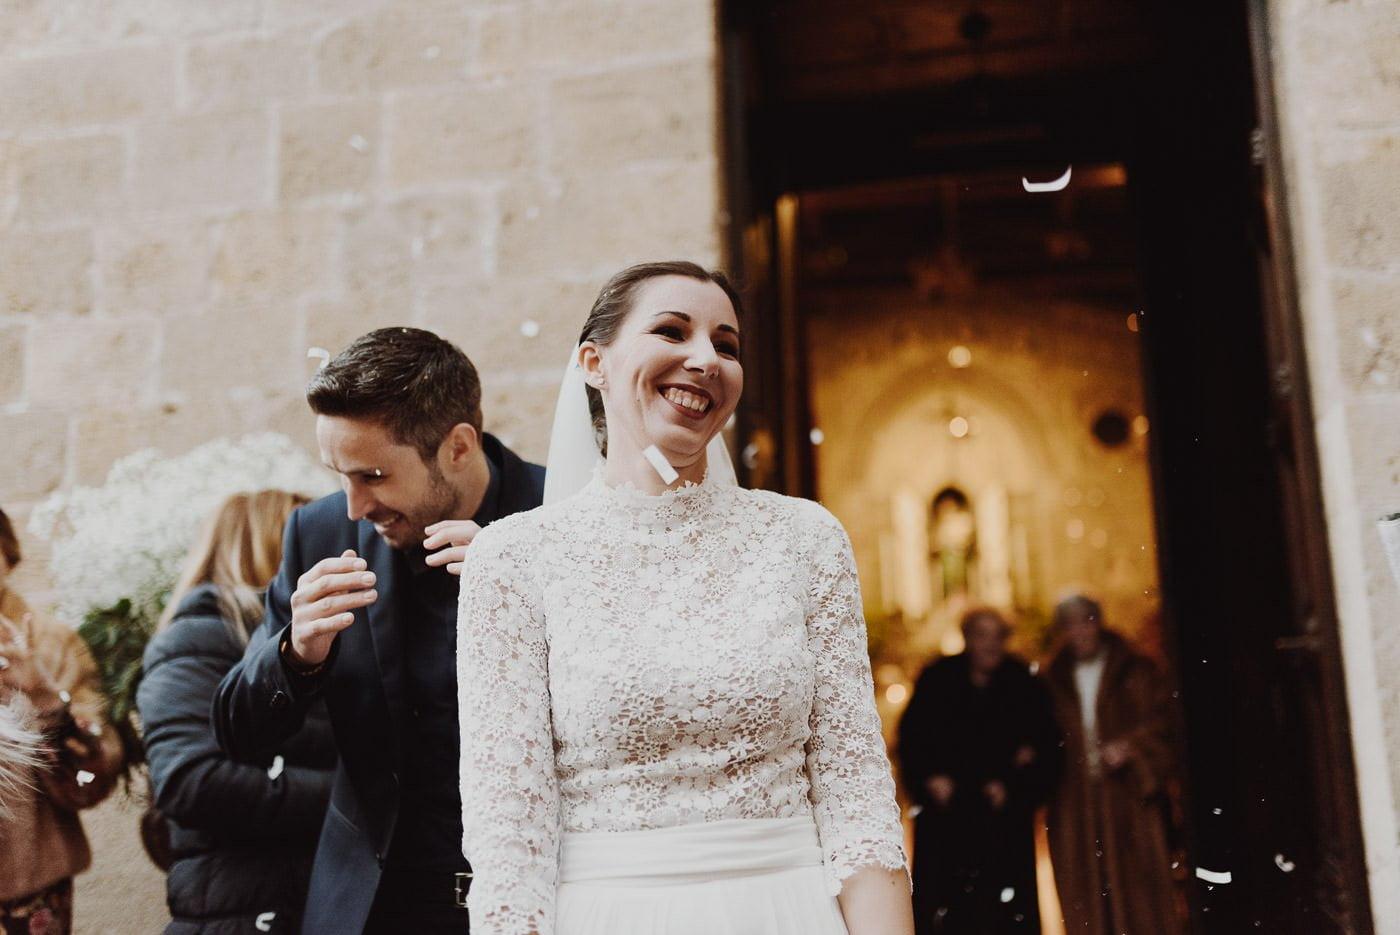 Matrimonio Giulia & Alessandro 28_12 – Alessio Nobili Photographer-30